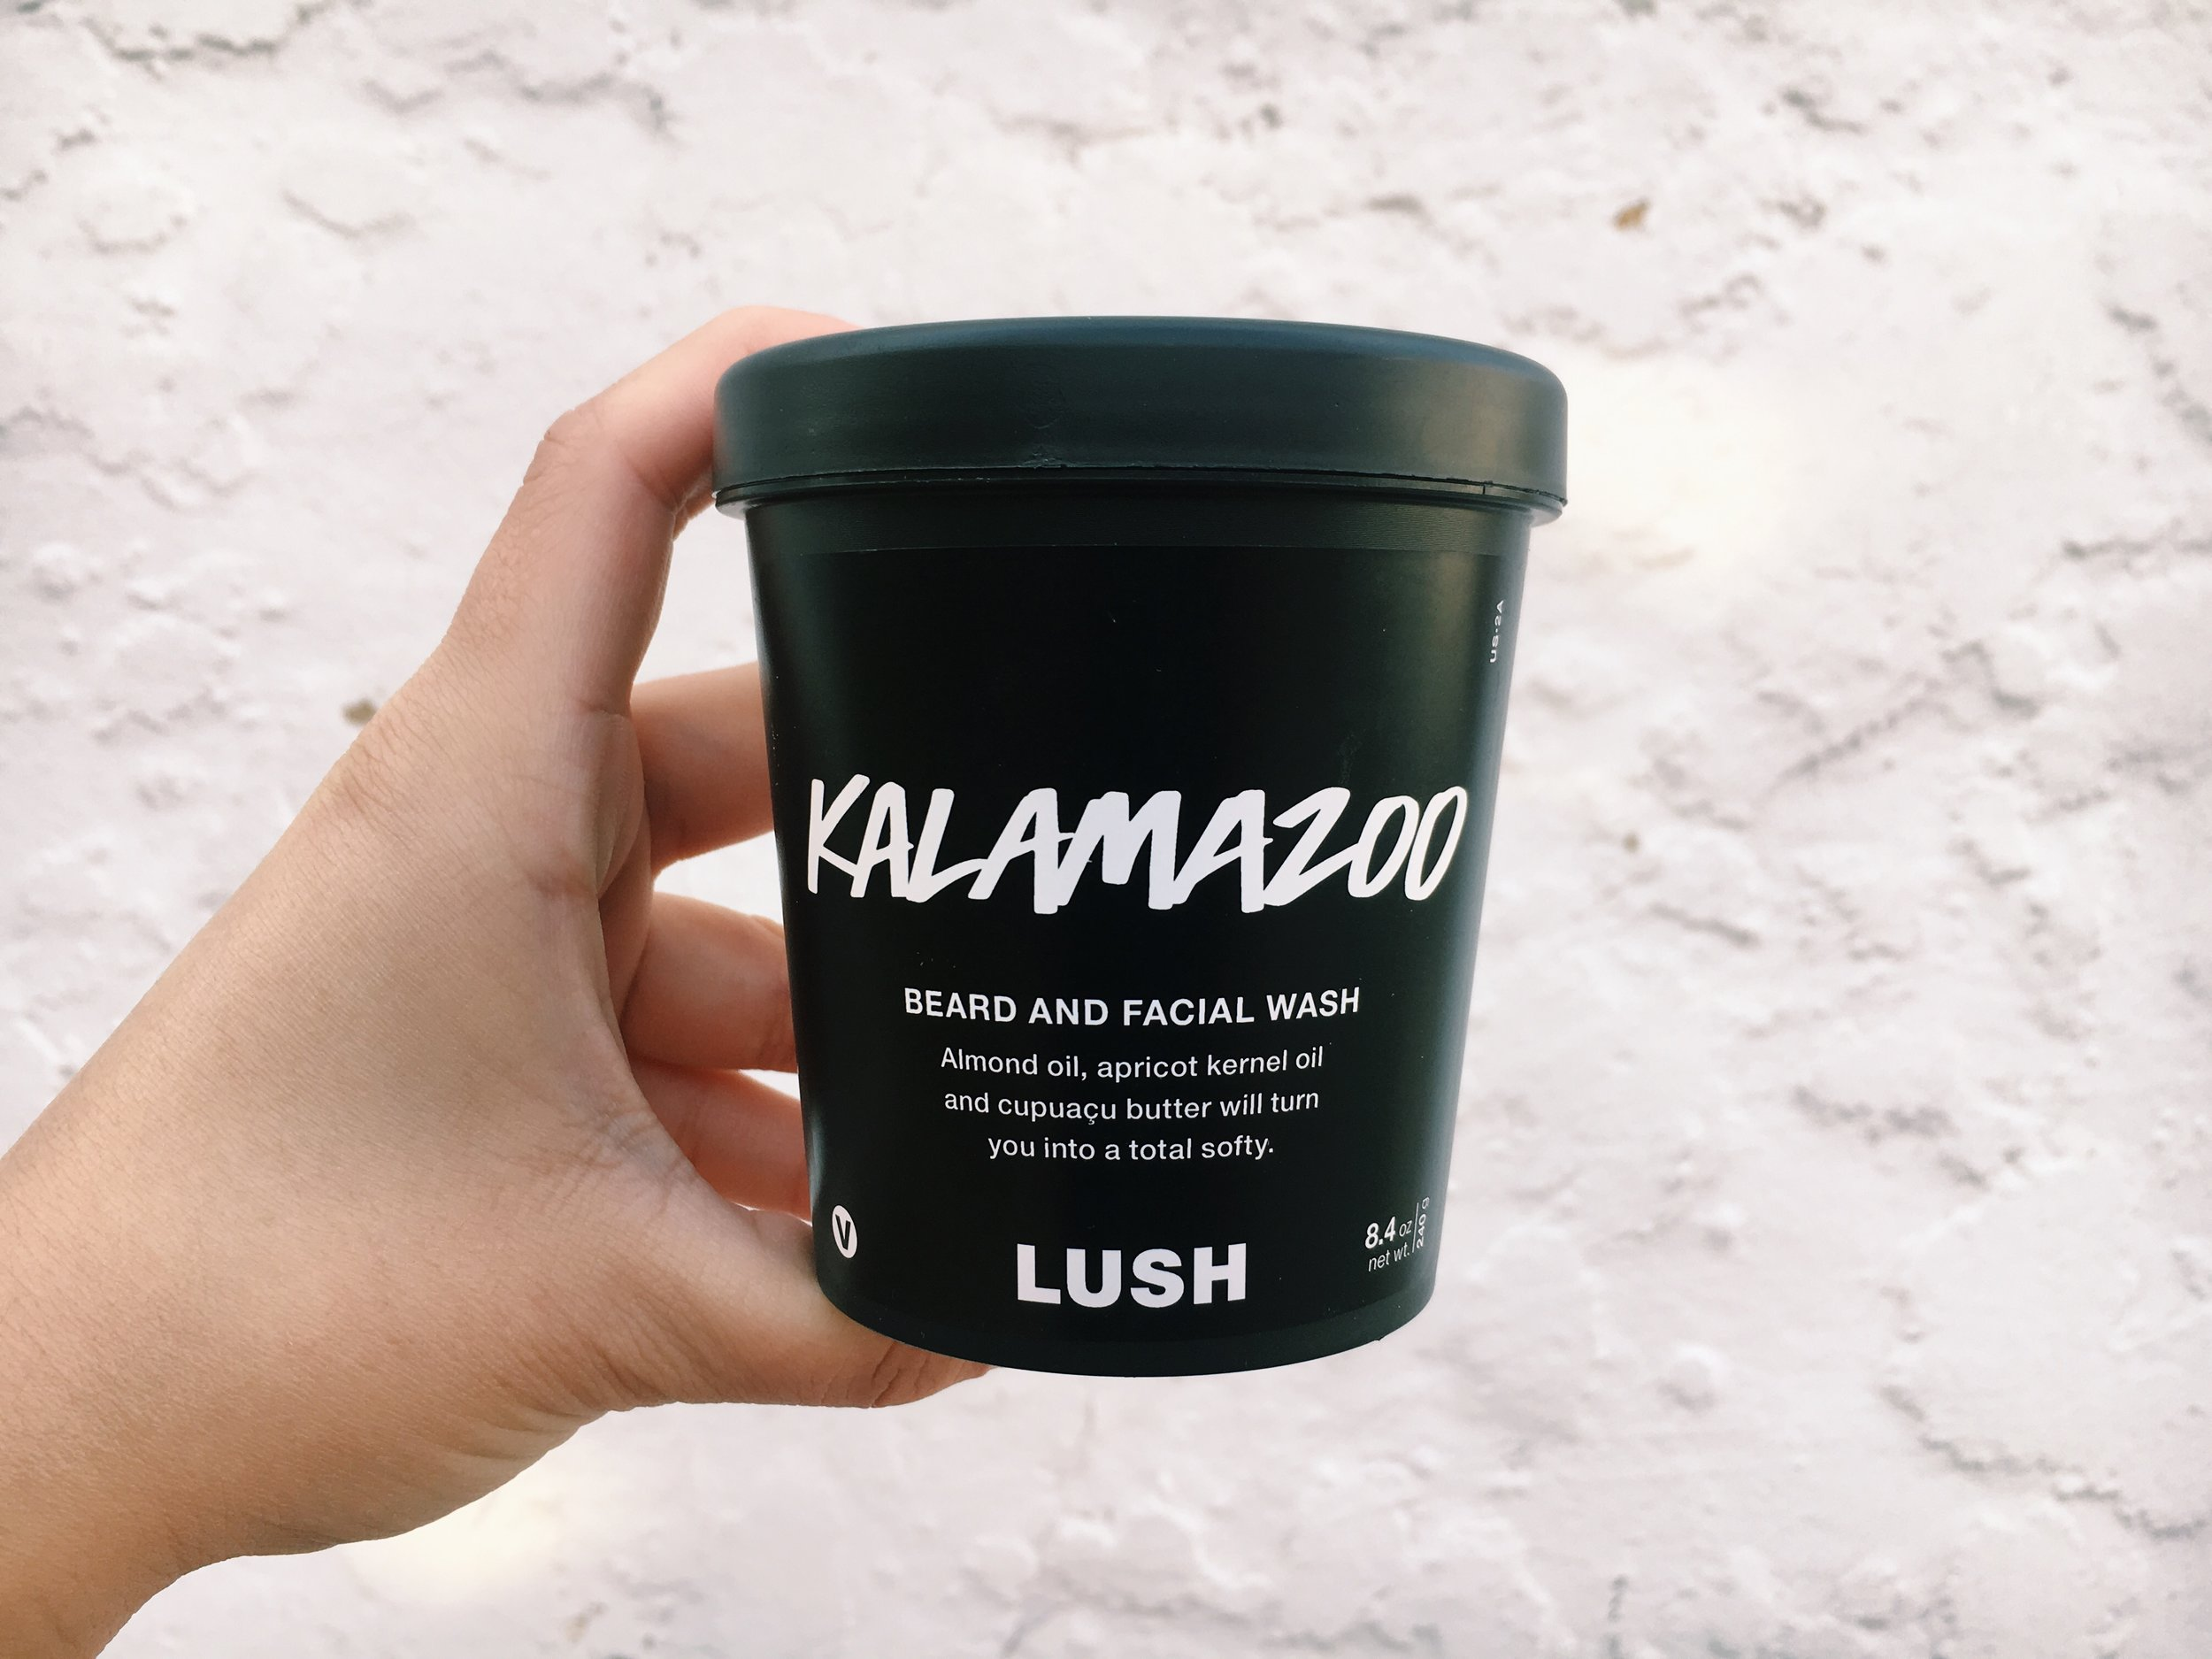 LUSH's Kalamazoo